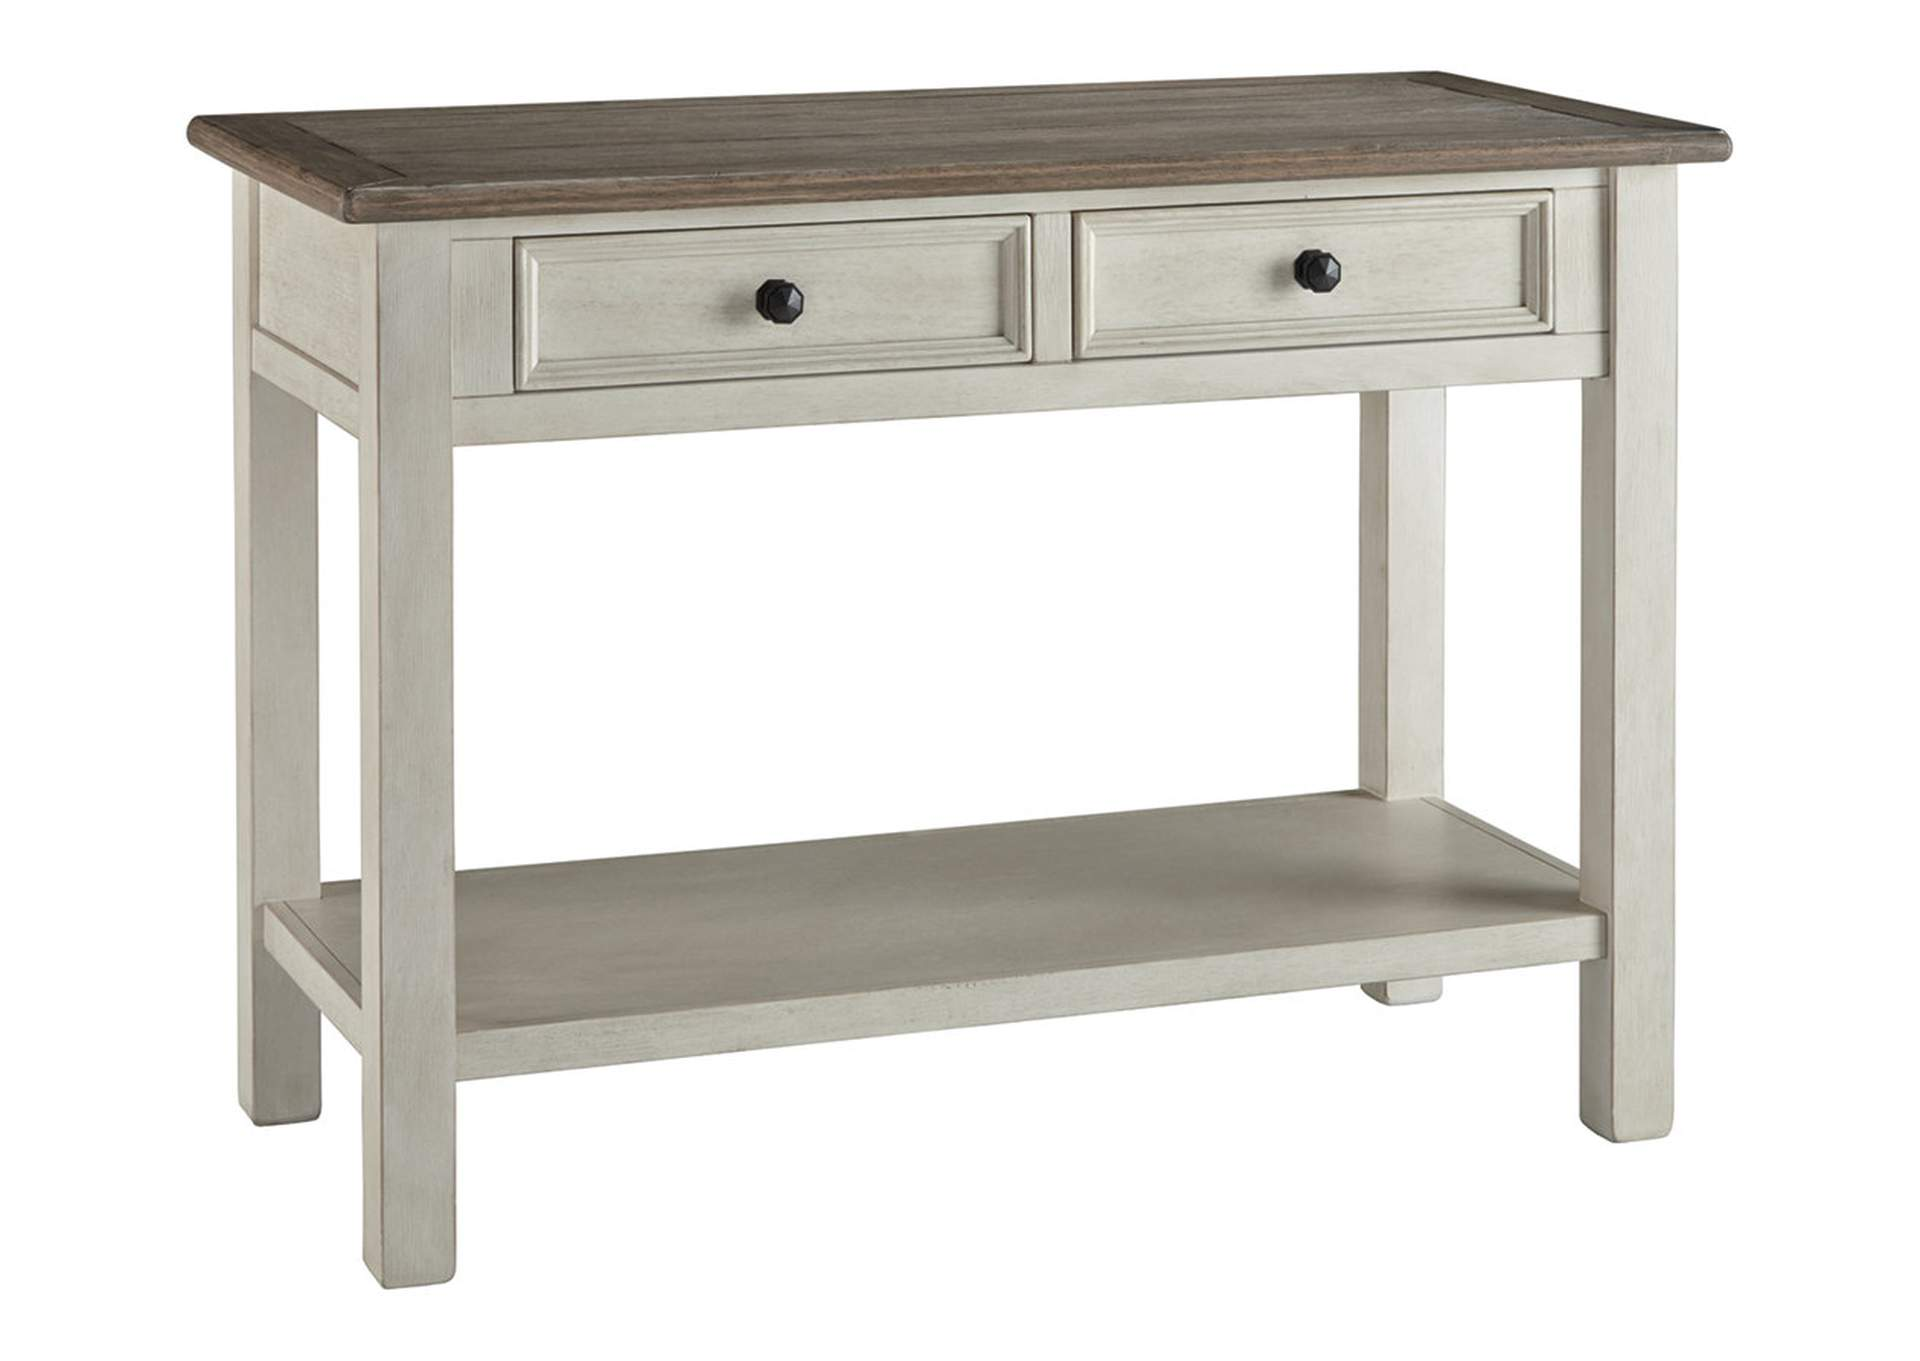 Bolanburg Sofa/Console Table